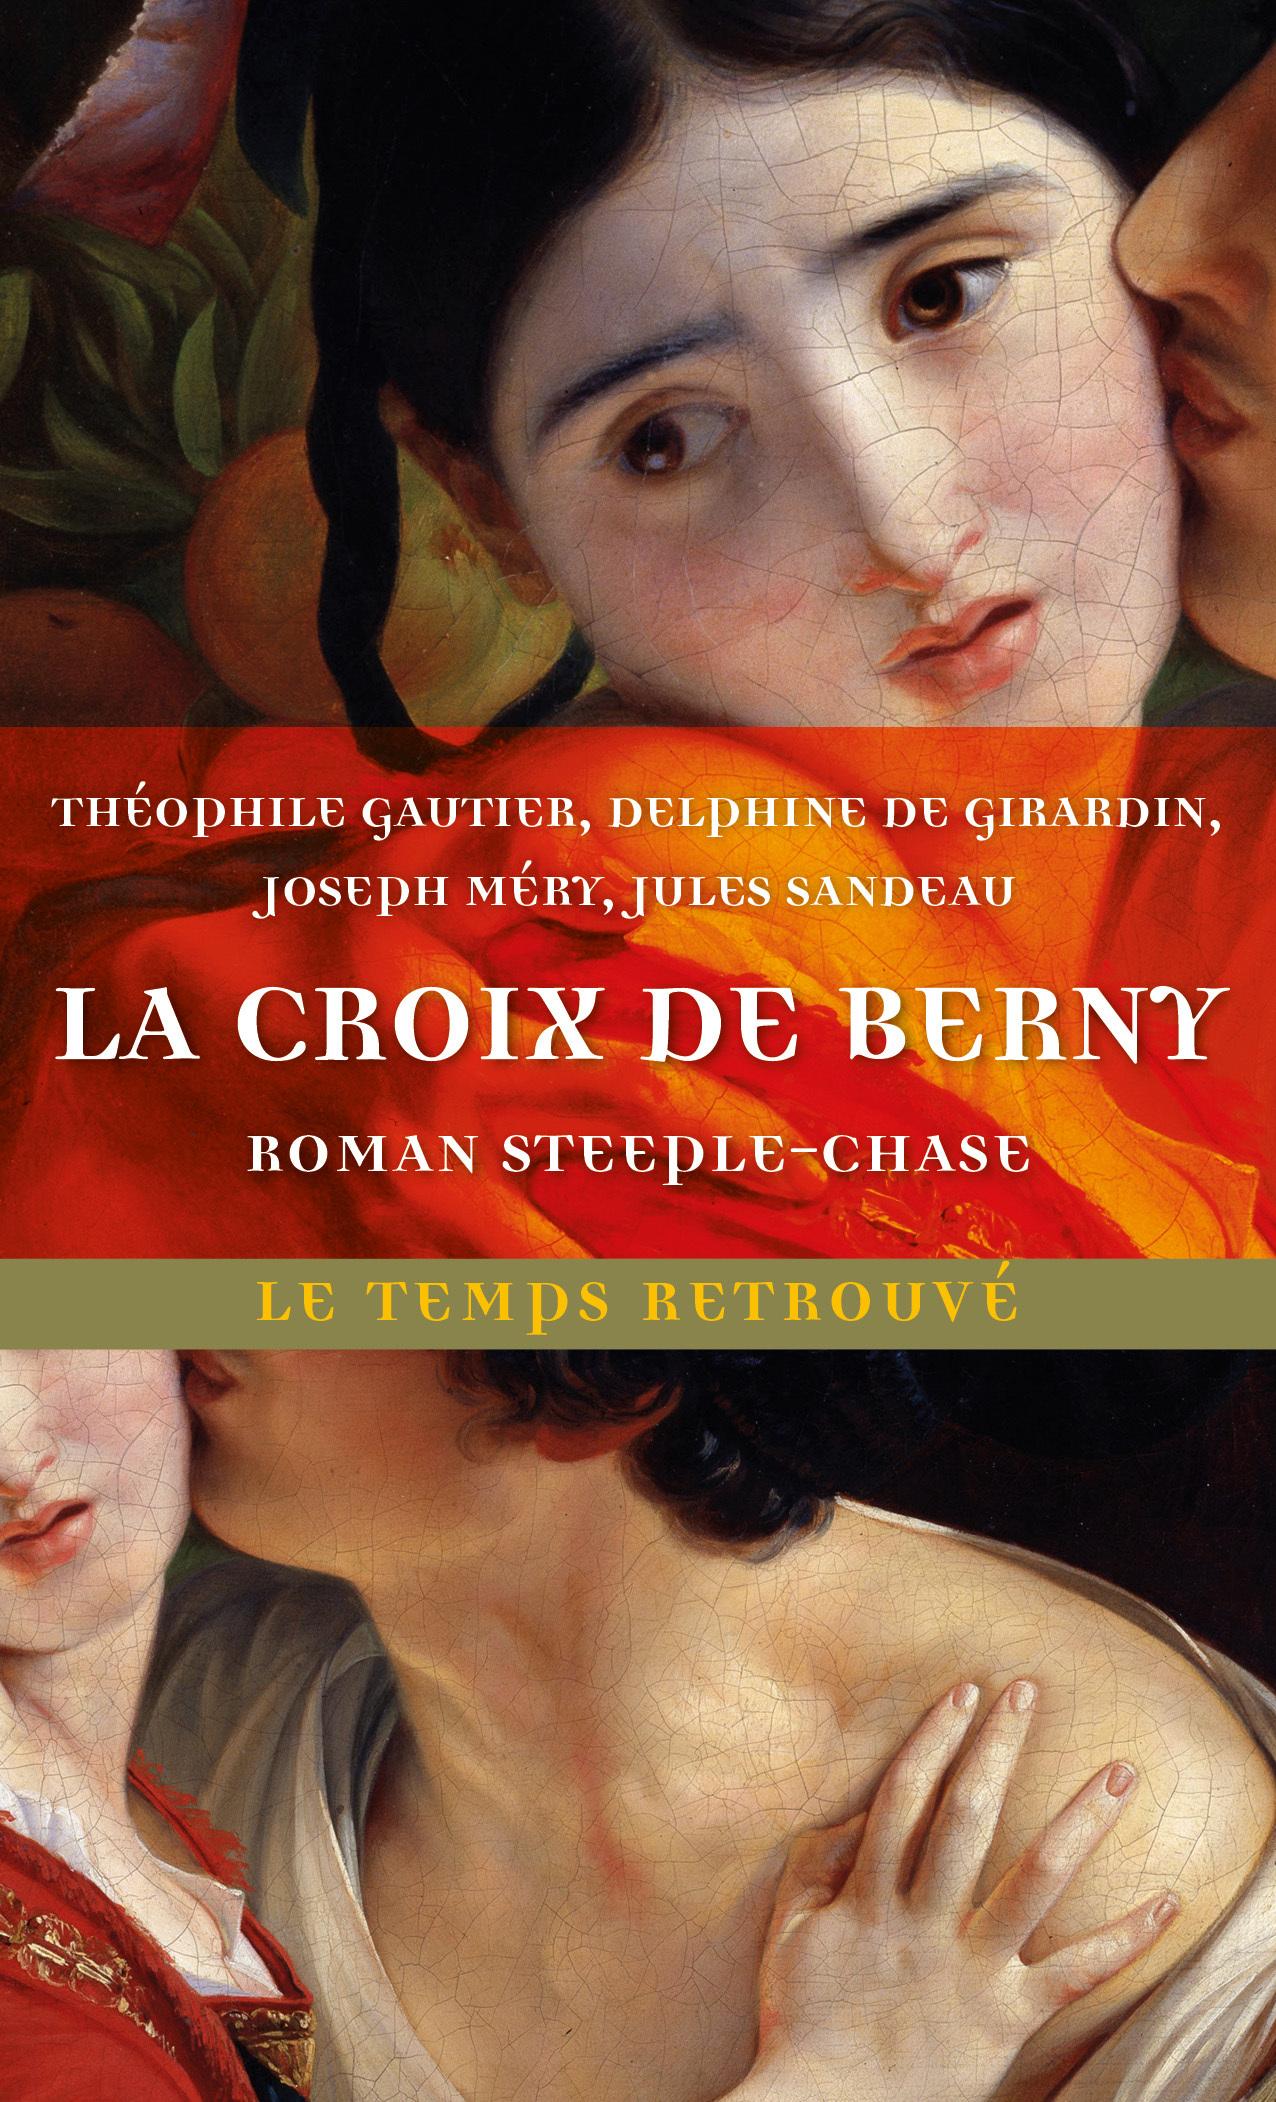 LA CROIX DE BERNY - ROMAN STEEPLE-CHASE